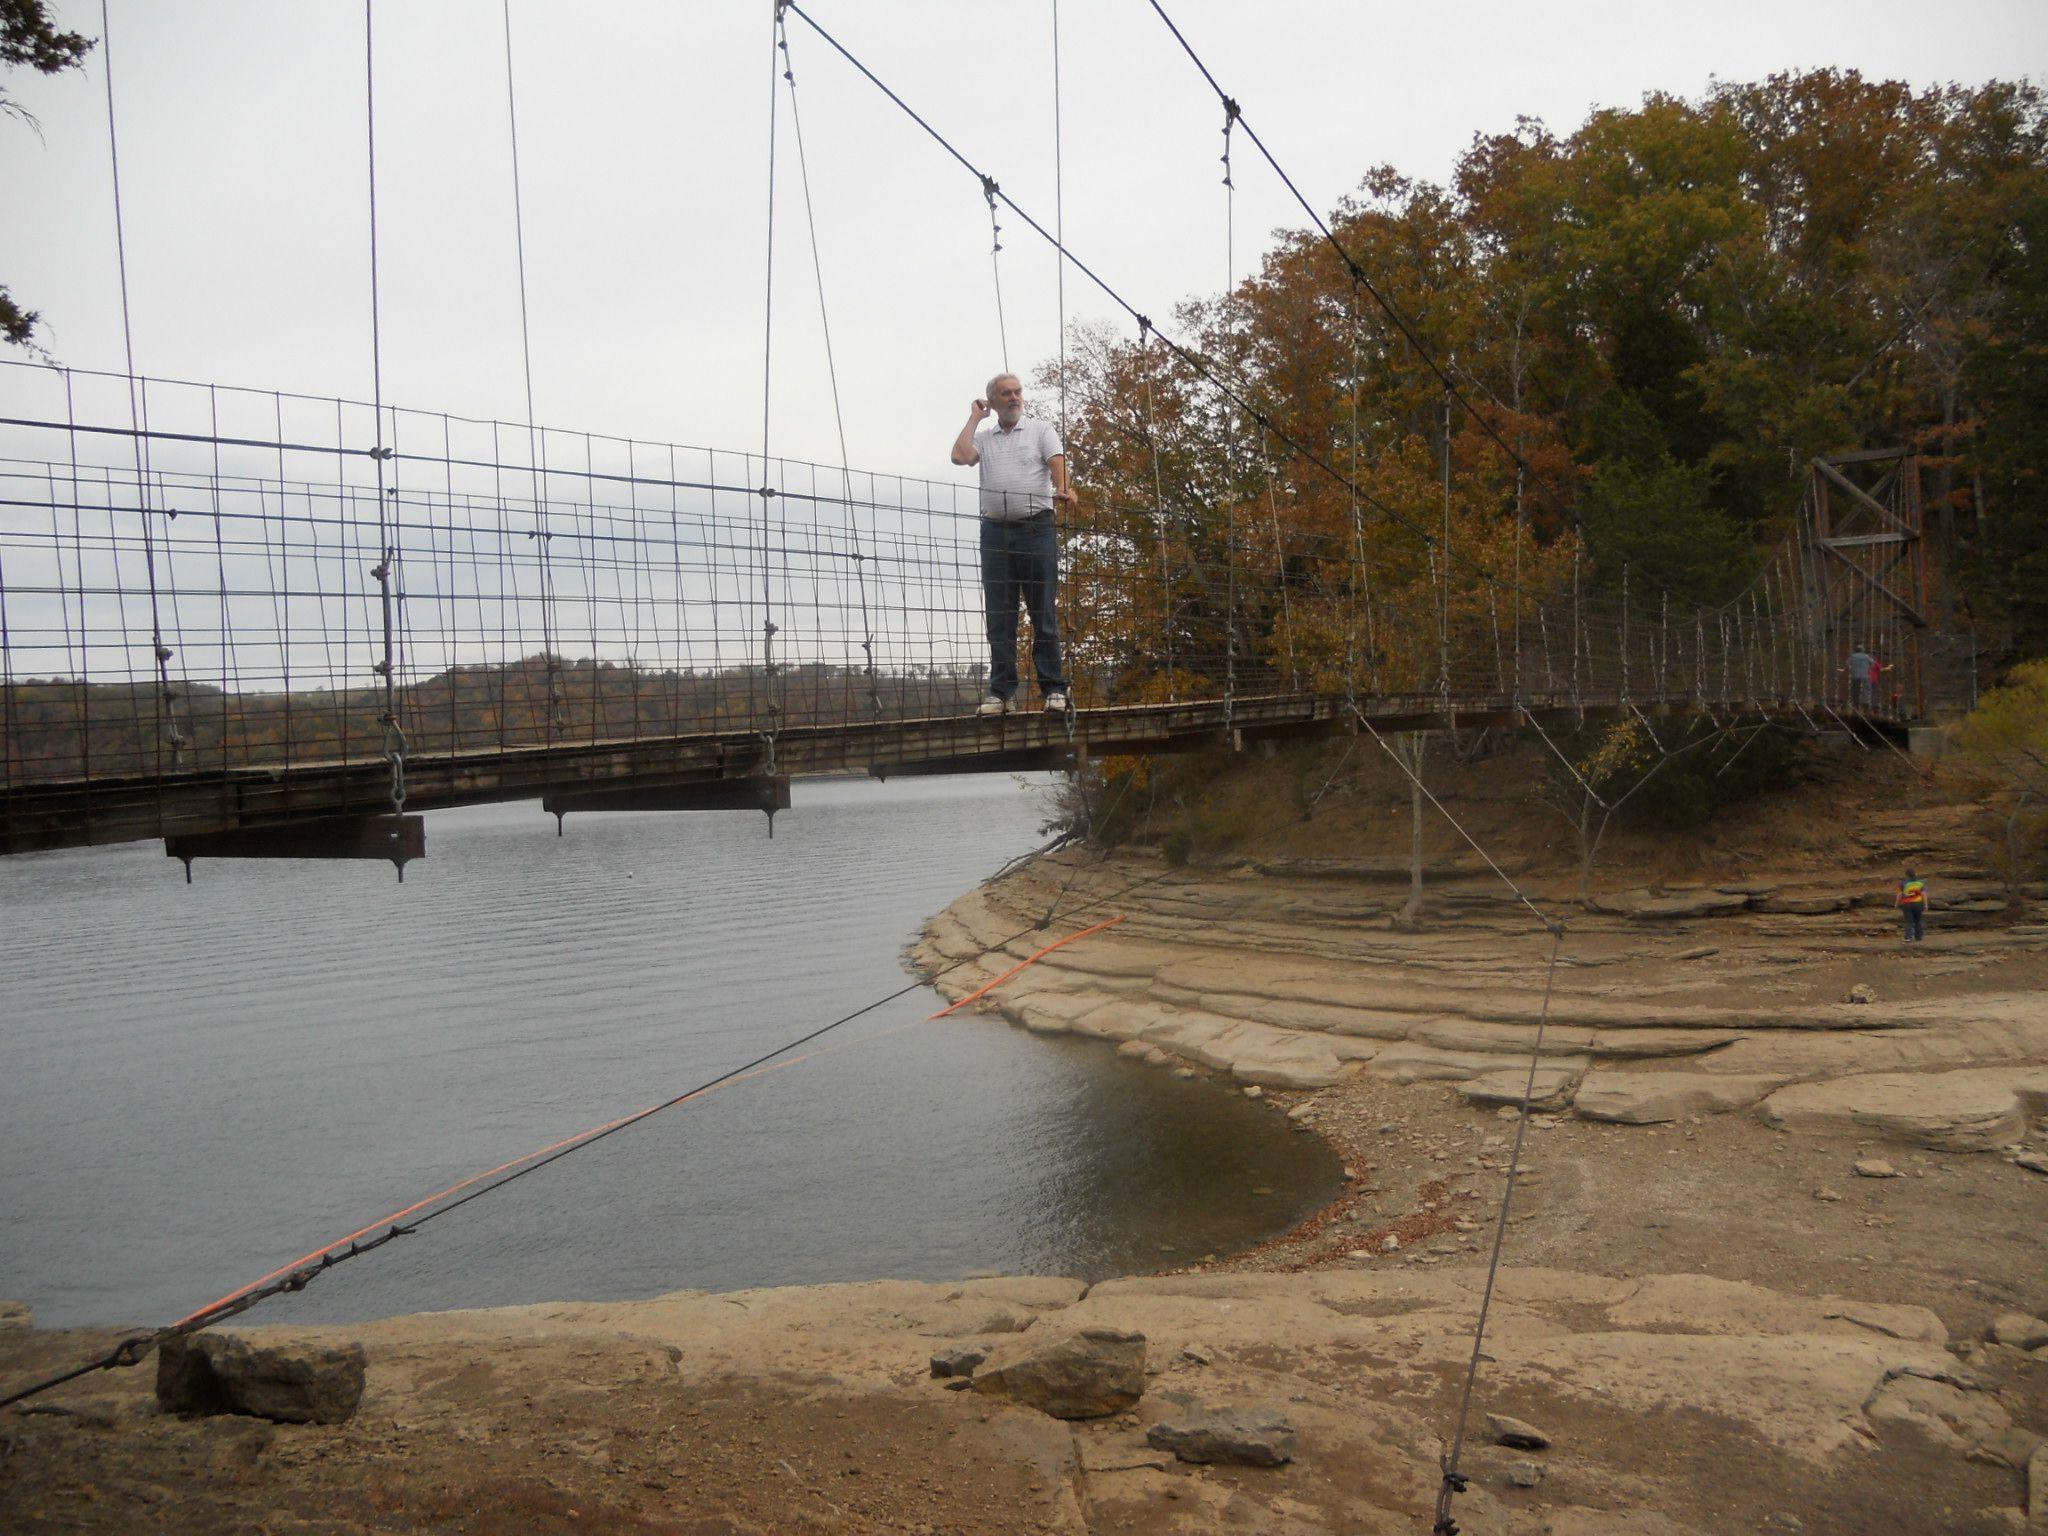 The swinging bridge at dale hallow lake near celina tn